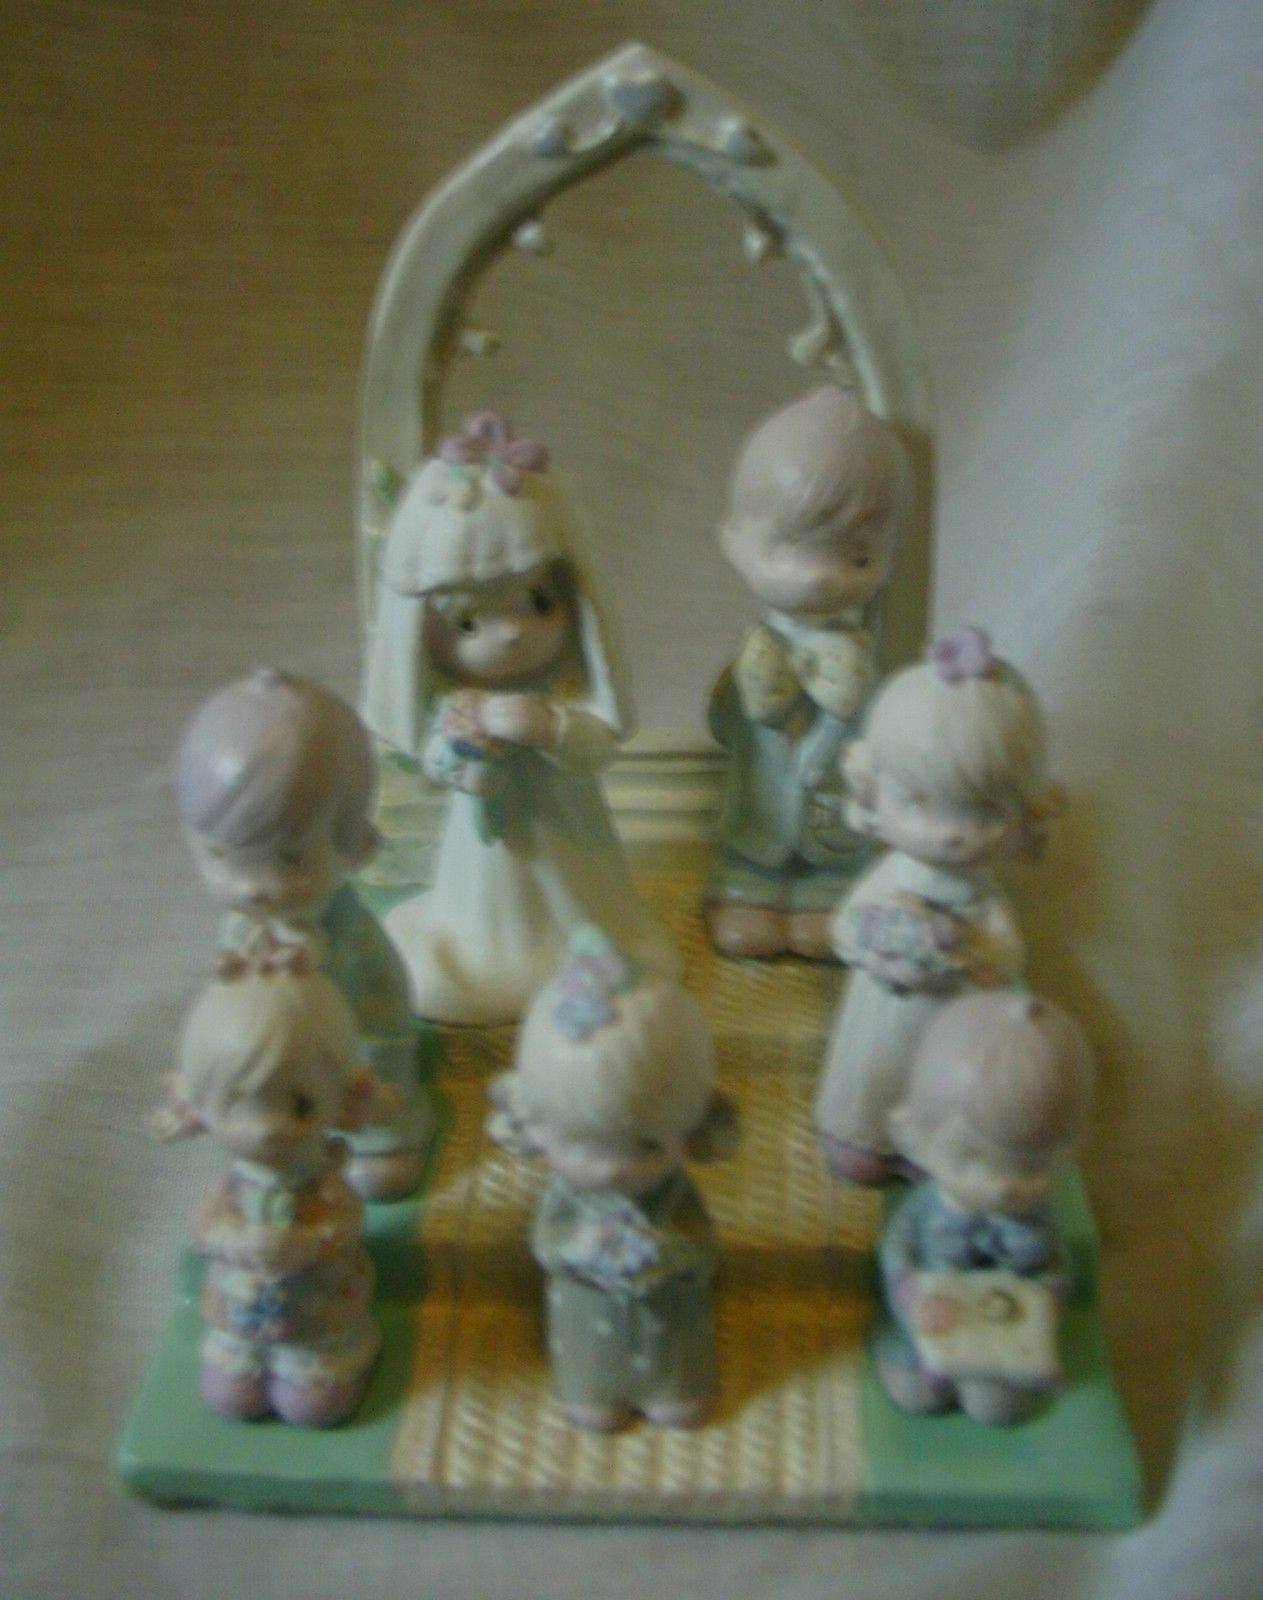 Precious Moments Miniature Pewter Bridal Set 1989 image 3